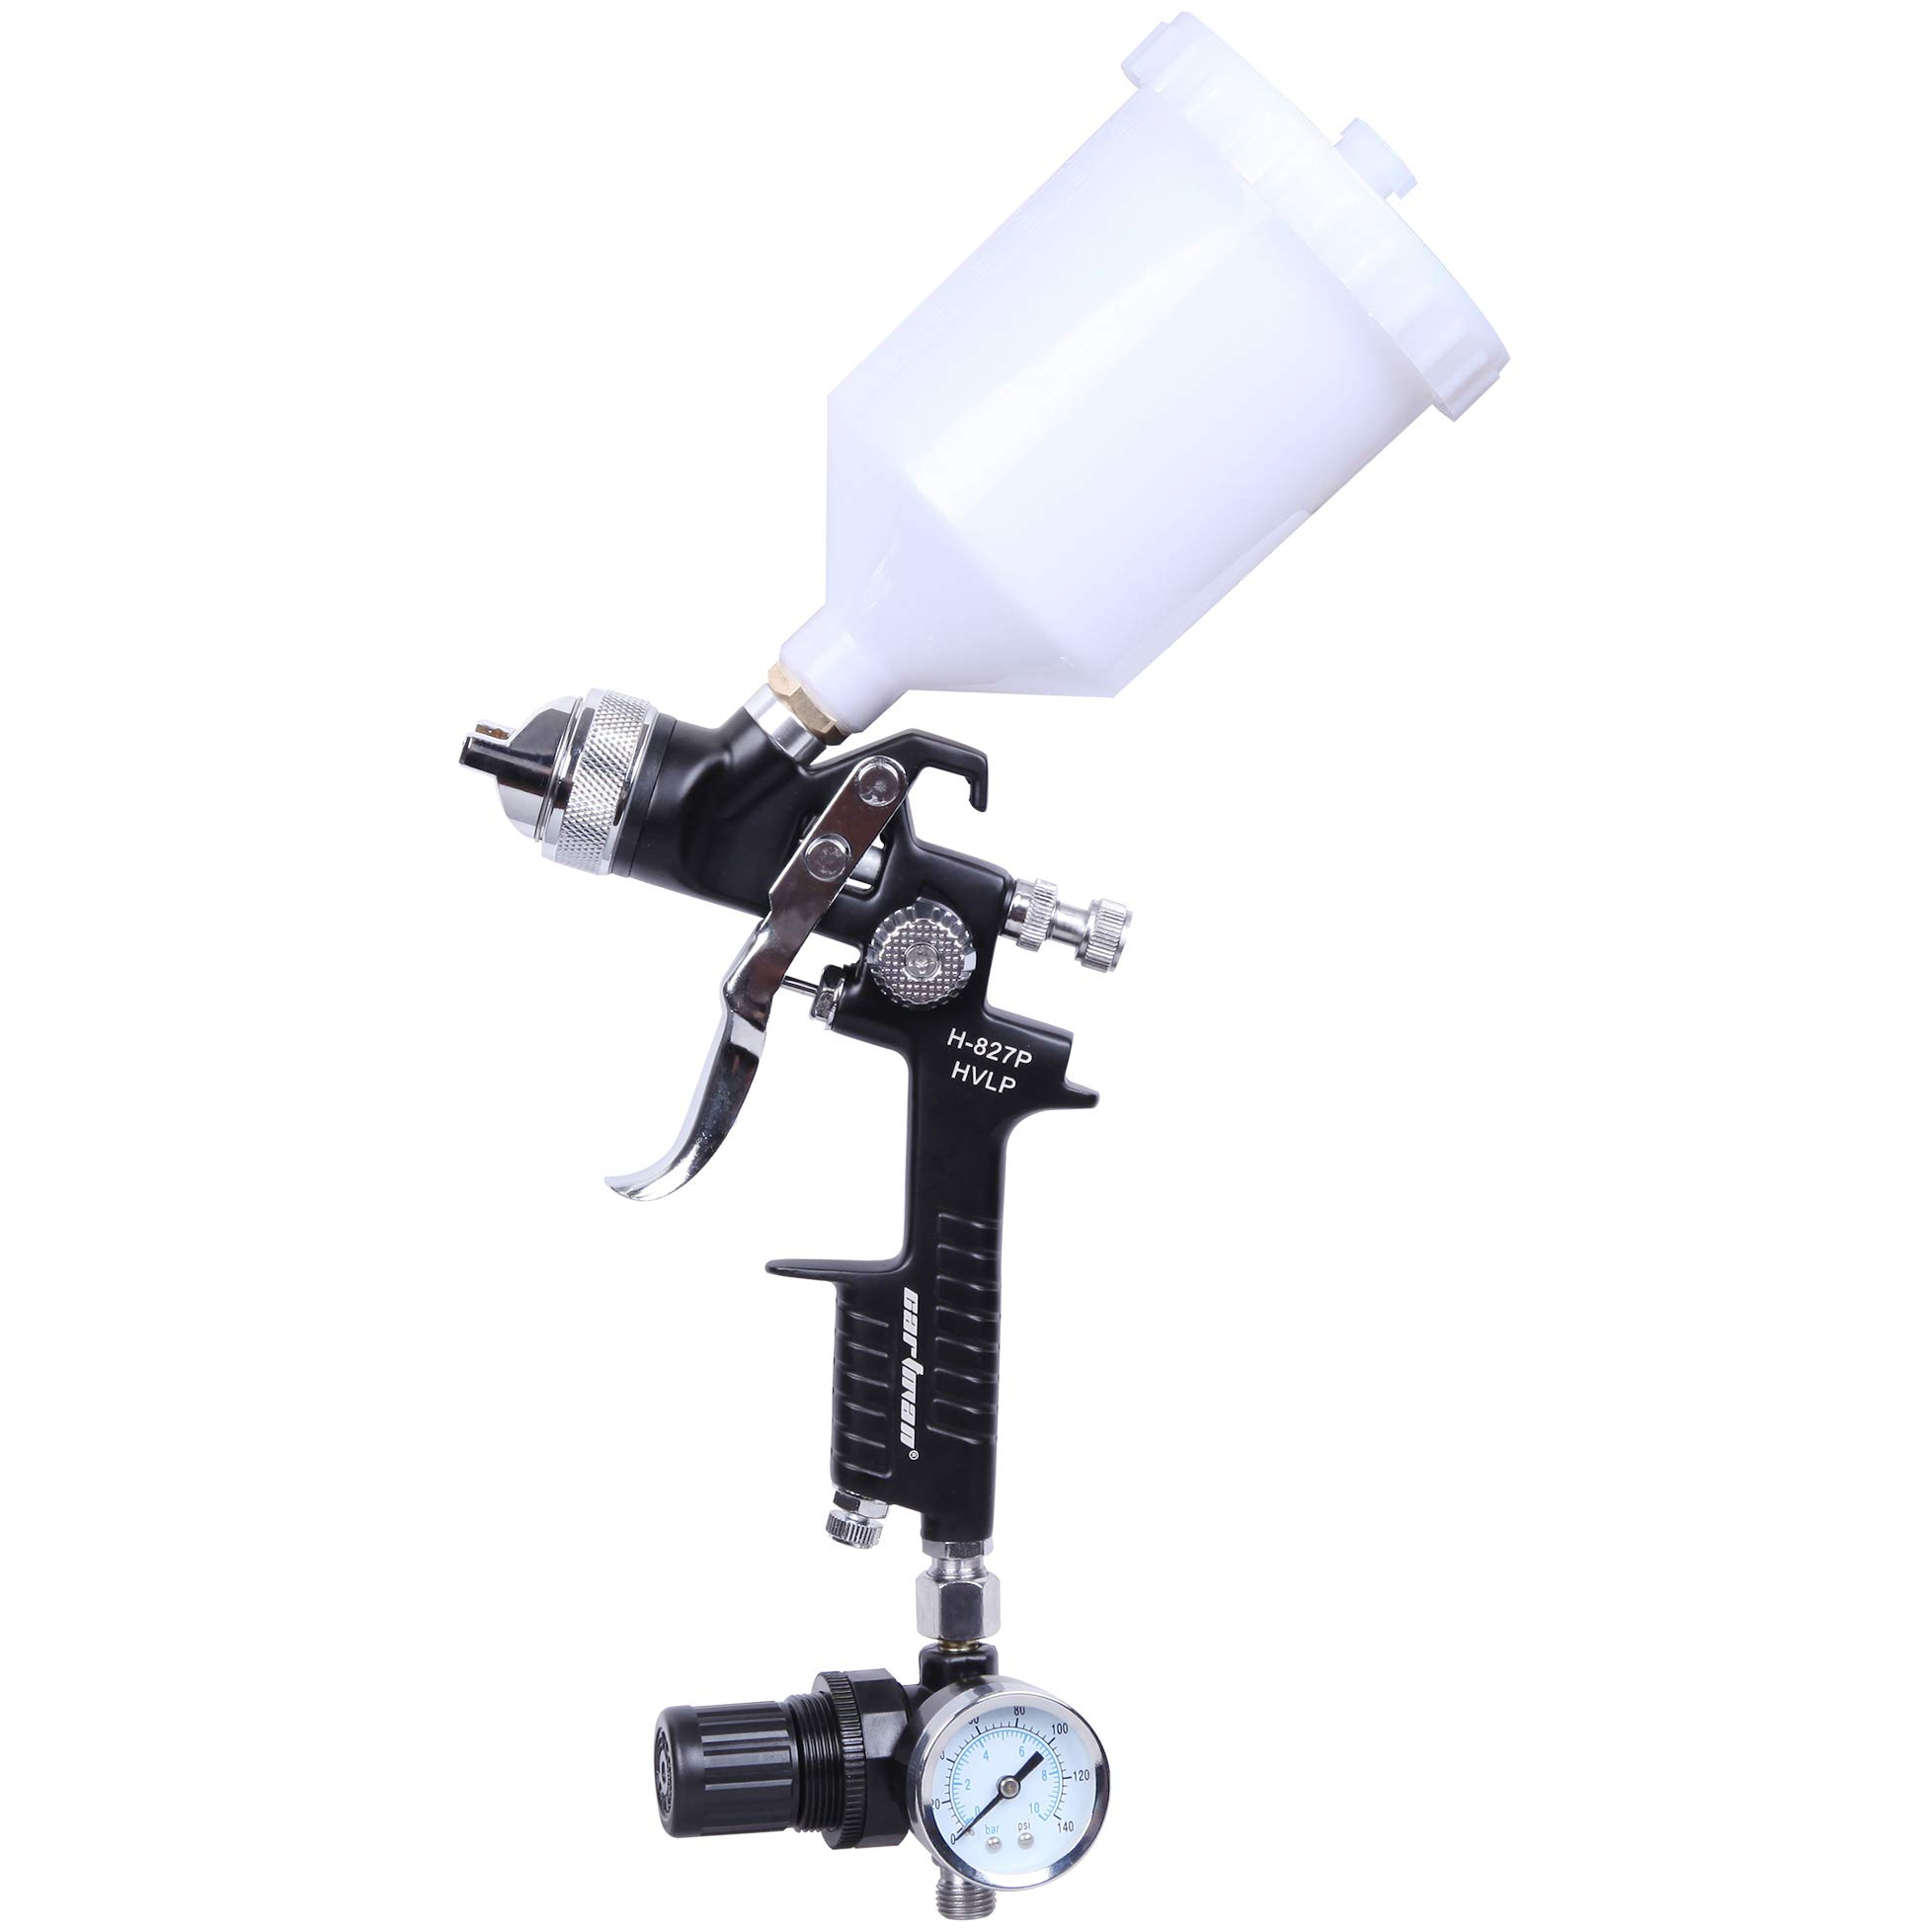 CARTMAN HVLP Gravity Feed Air Spray Gun H-827, H-827P, 20.2 oz Capacity, 2.5-3.5 CFM (Cubic feet per Minute), Optimal Working Pressure 3.0bar/43psi, Nozzle Size:1.4mm with Air Regulator